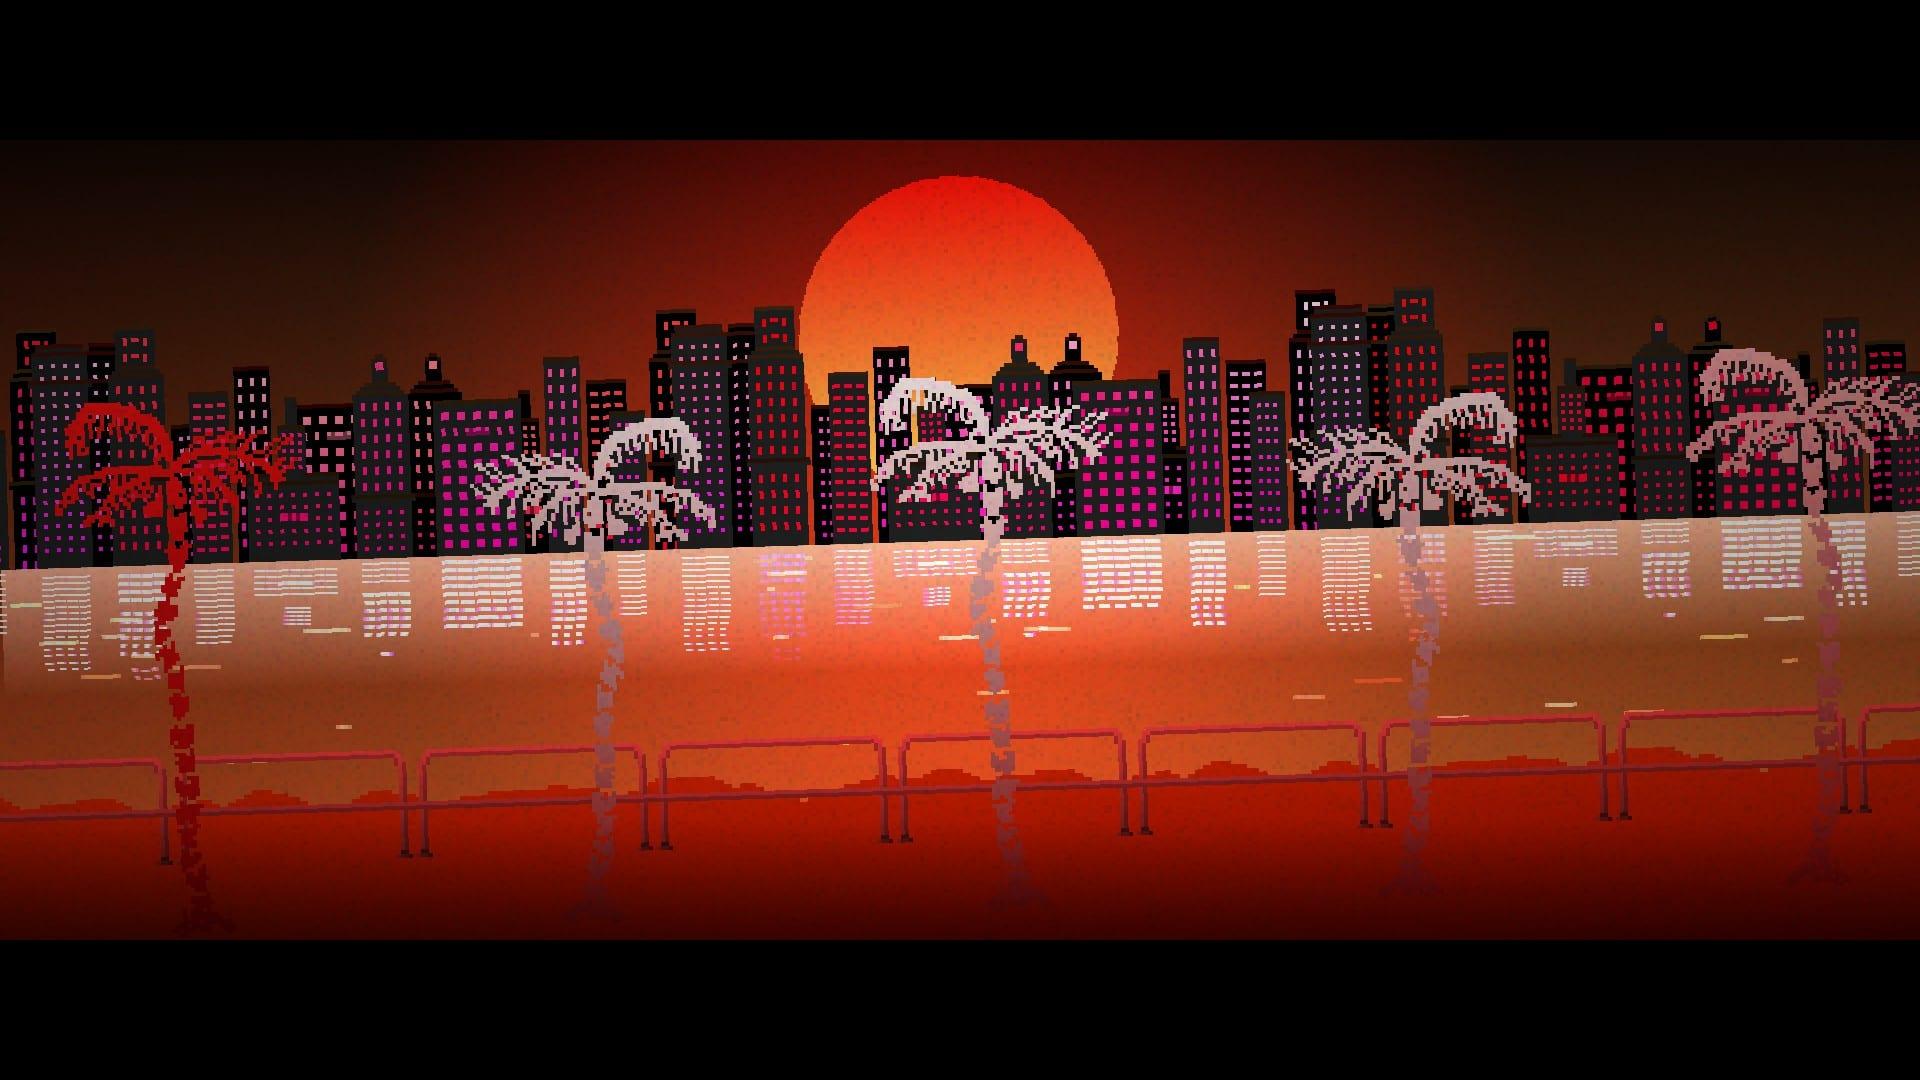 hotline-miami-2-screen-sunset